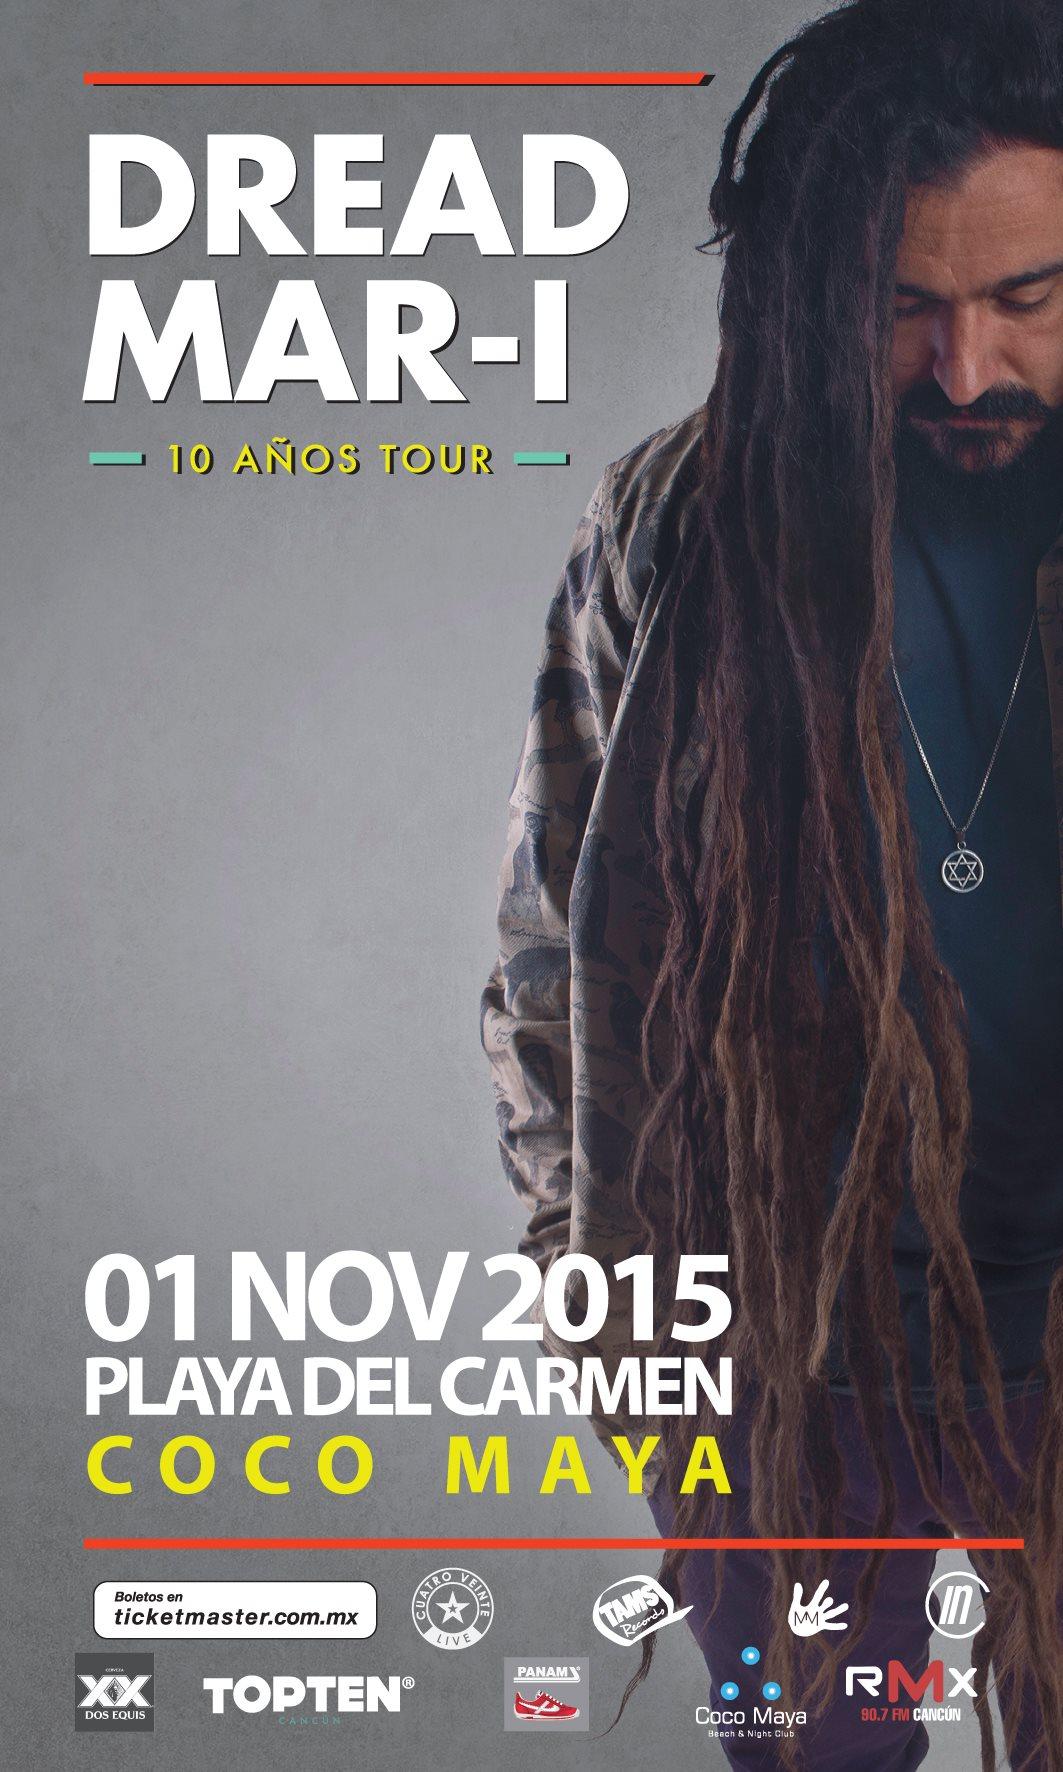 Dread Mar I @ Coco Maya Playa del carmen